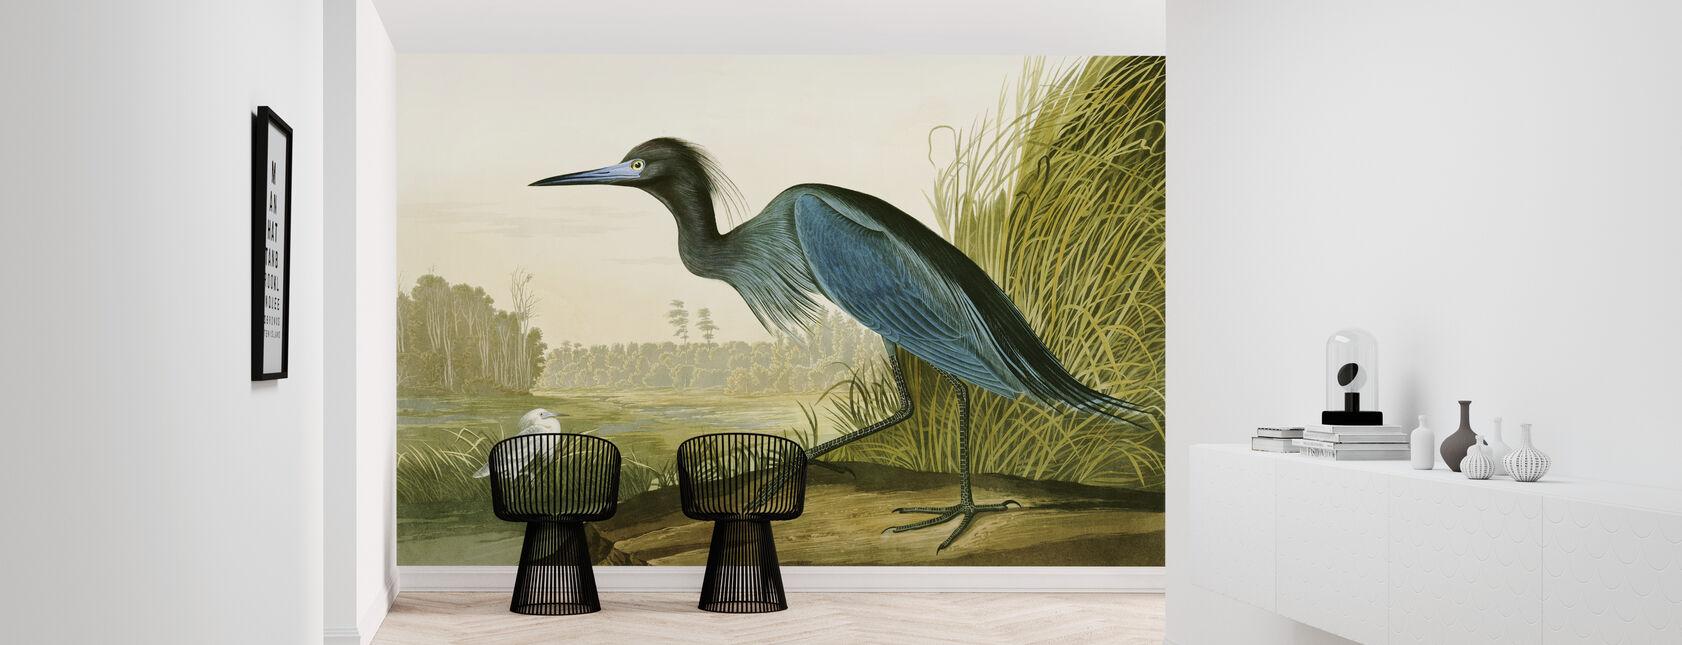 Little Blue Heron - John James Audubon - Wallpaper - Hallway